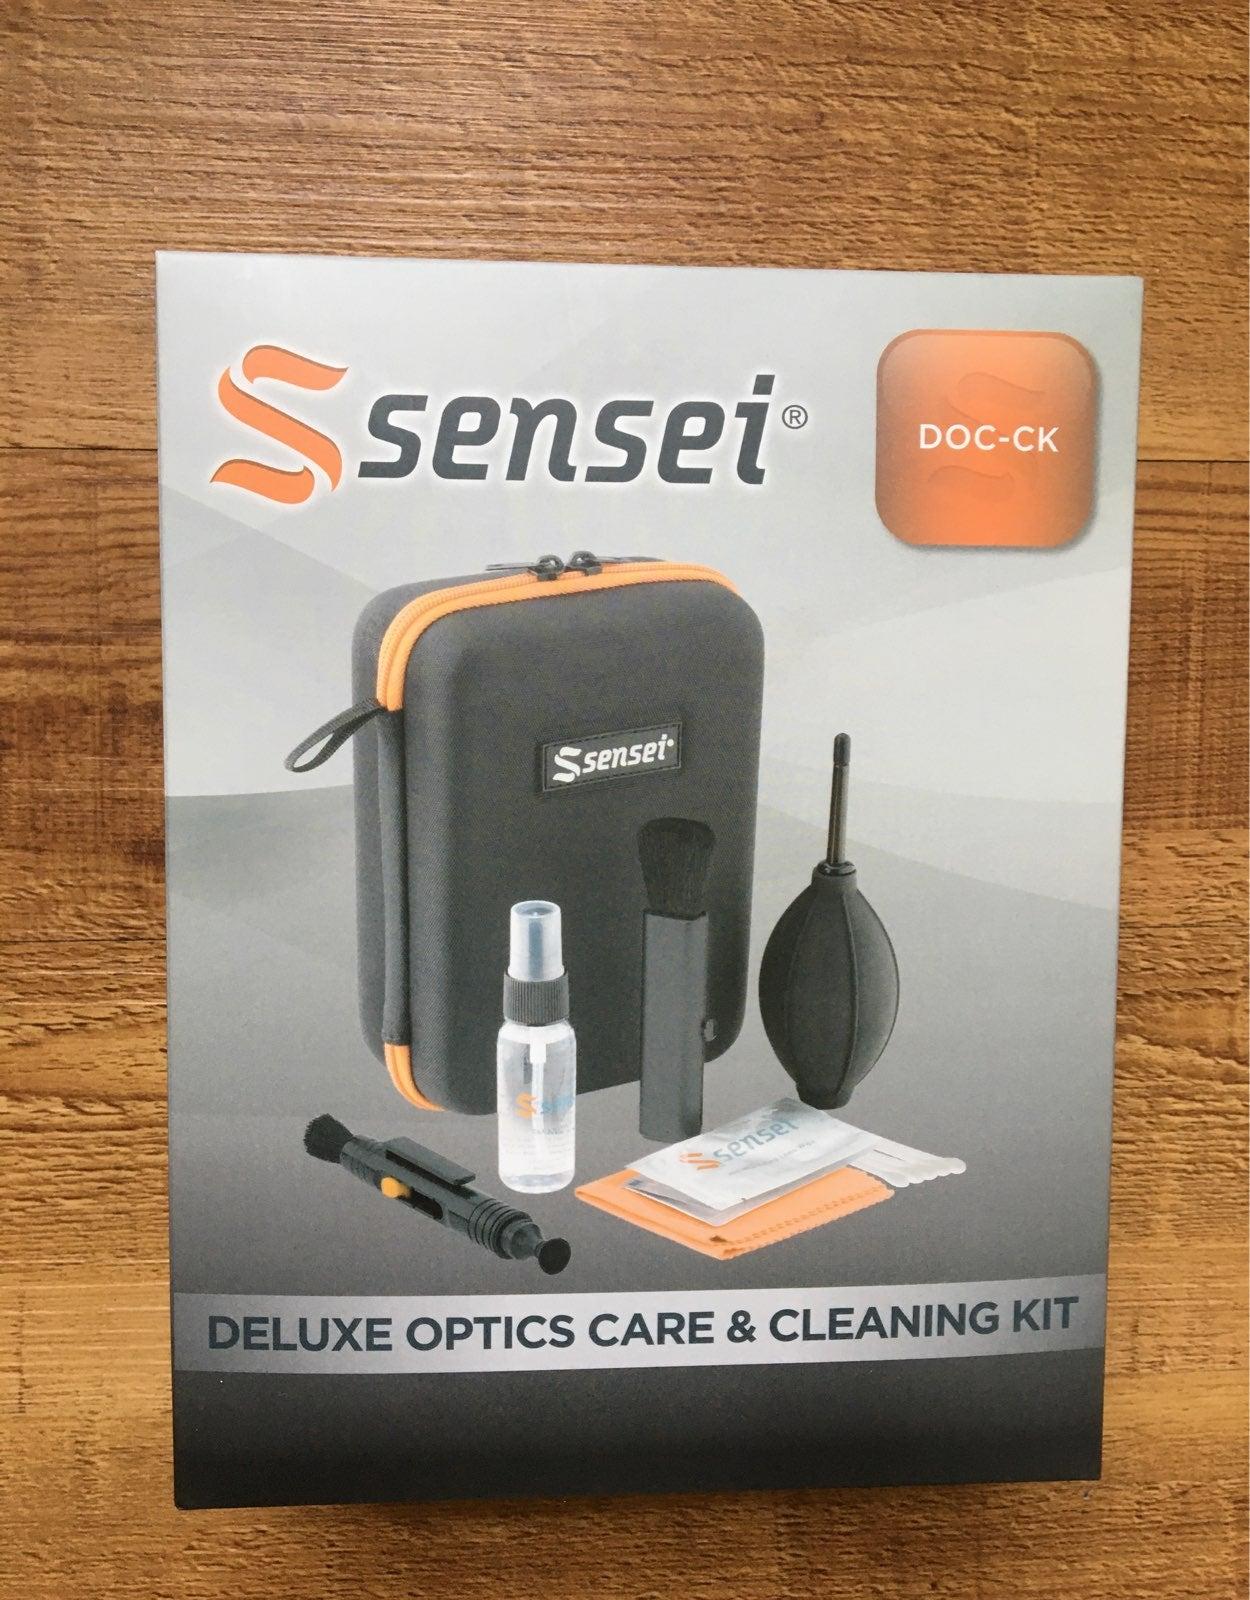 Sensei deluxe optics care & cleaning kit